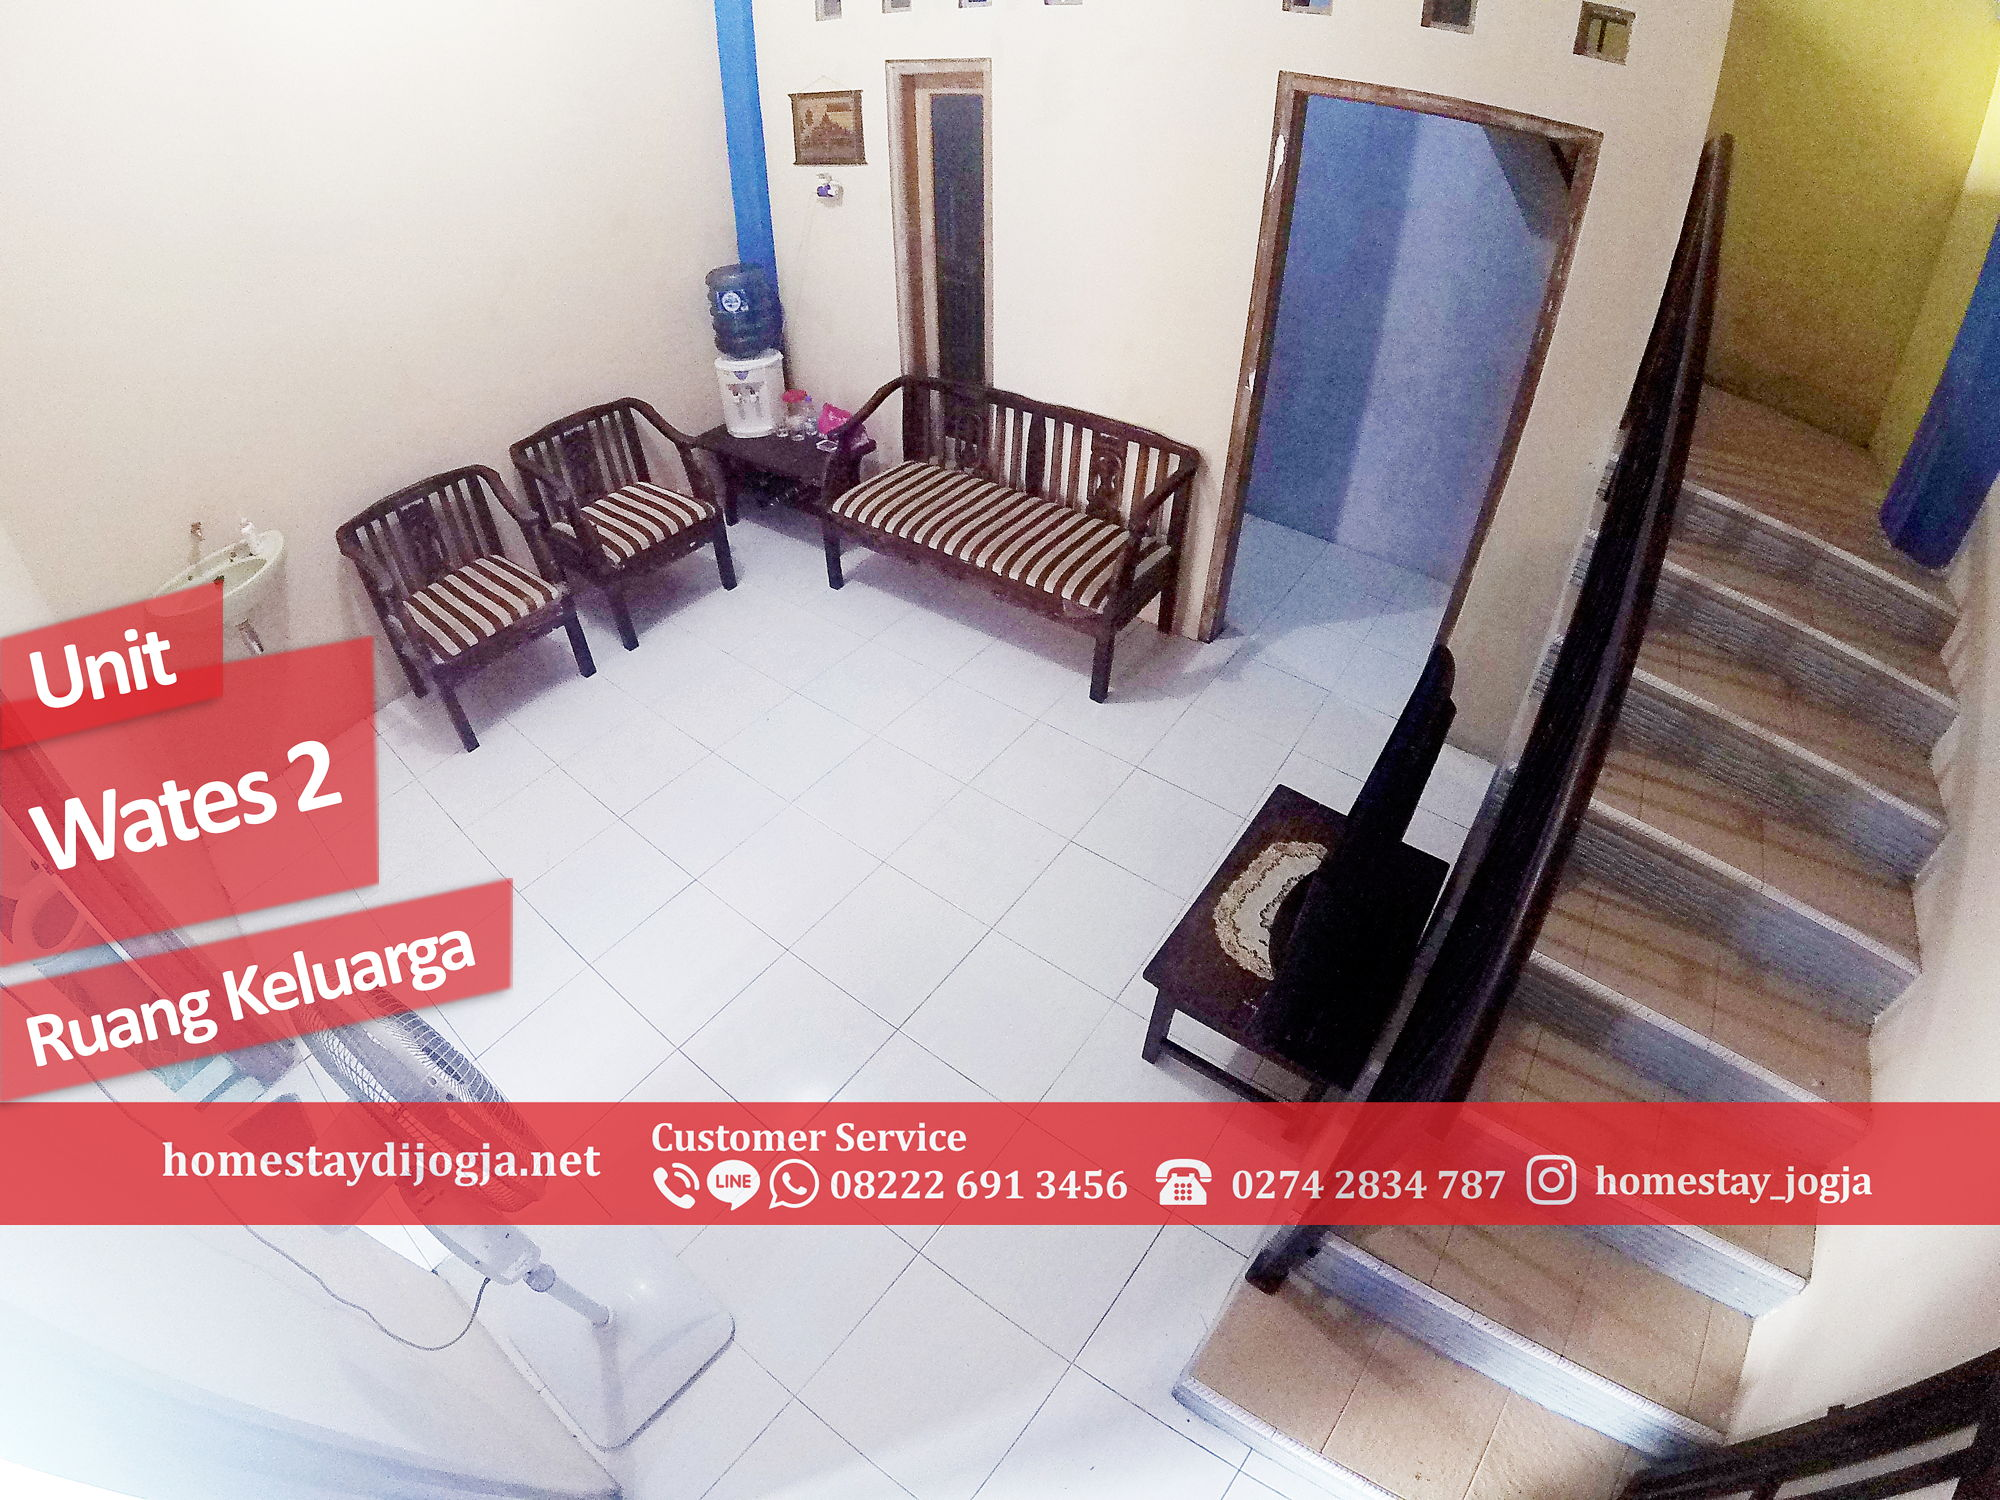 Homestay Jogja 4 Kamar Tidur 20 menit menuju malioboro di Jalan Wates km 7